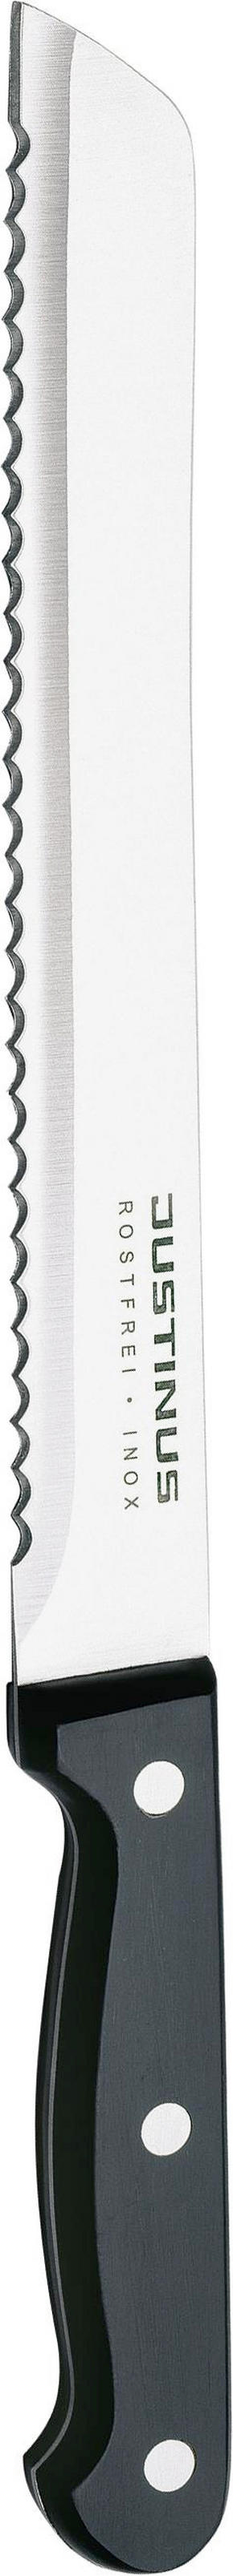 BRÖDKNIV - silver/svart, Basics, metall/plast (33cm) - Justinus